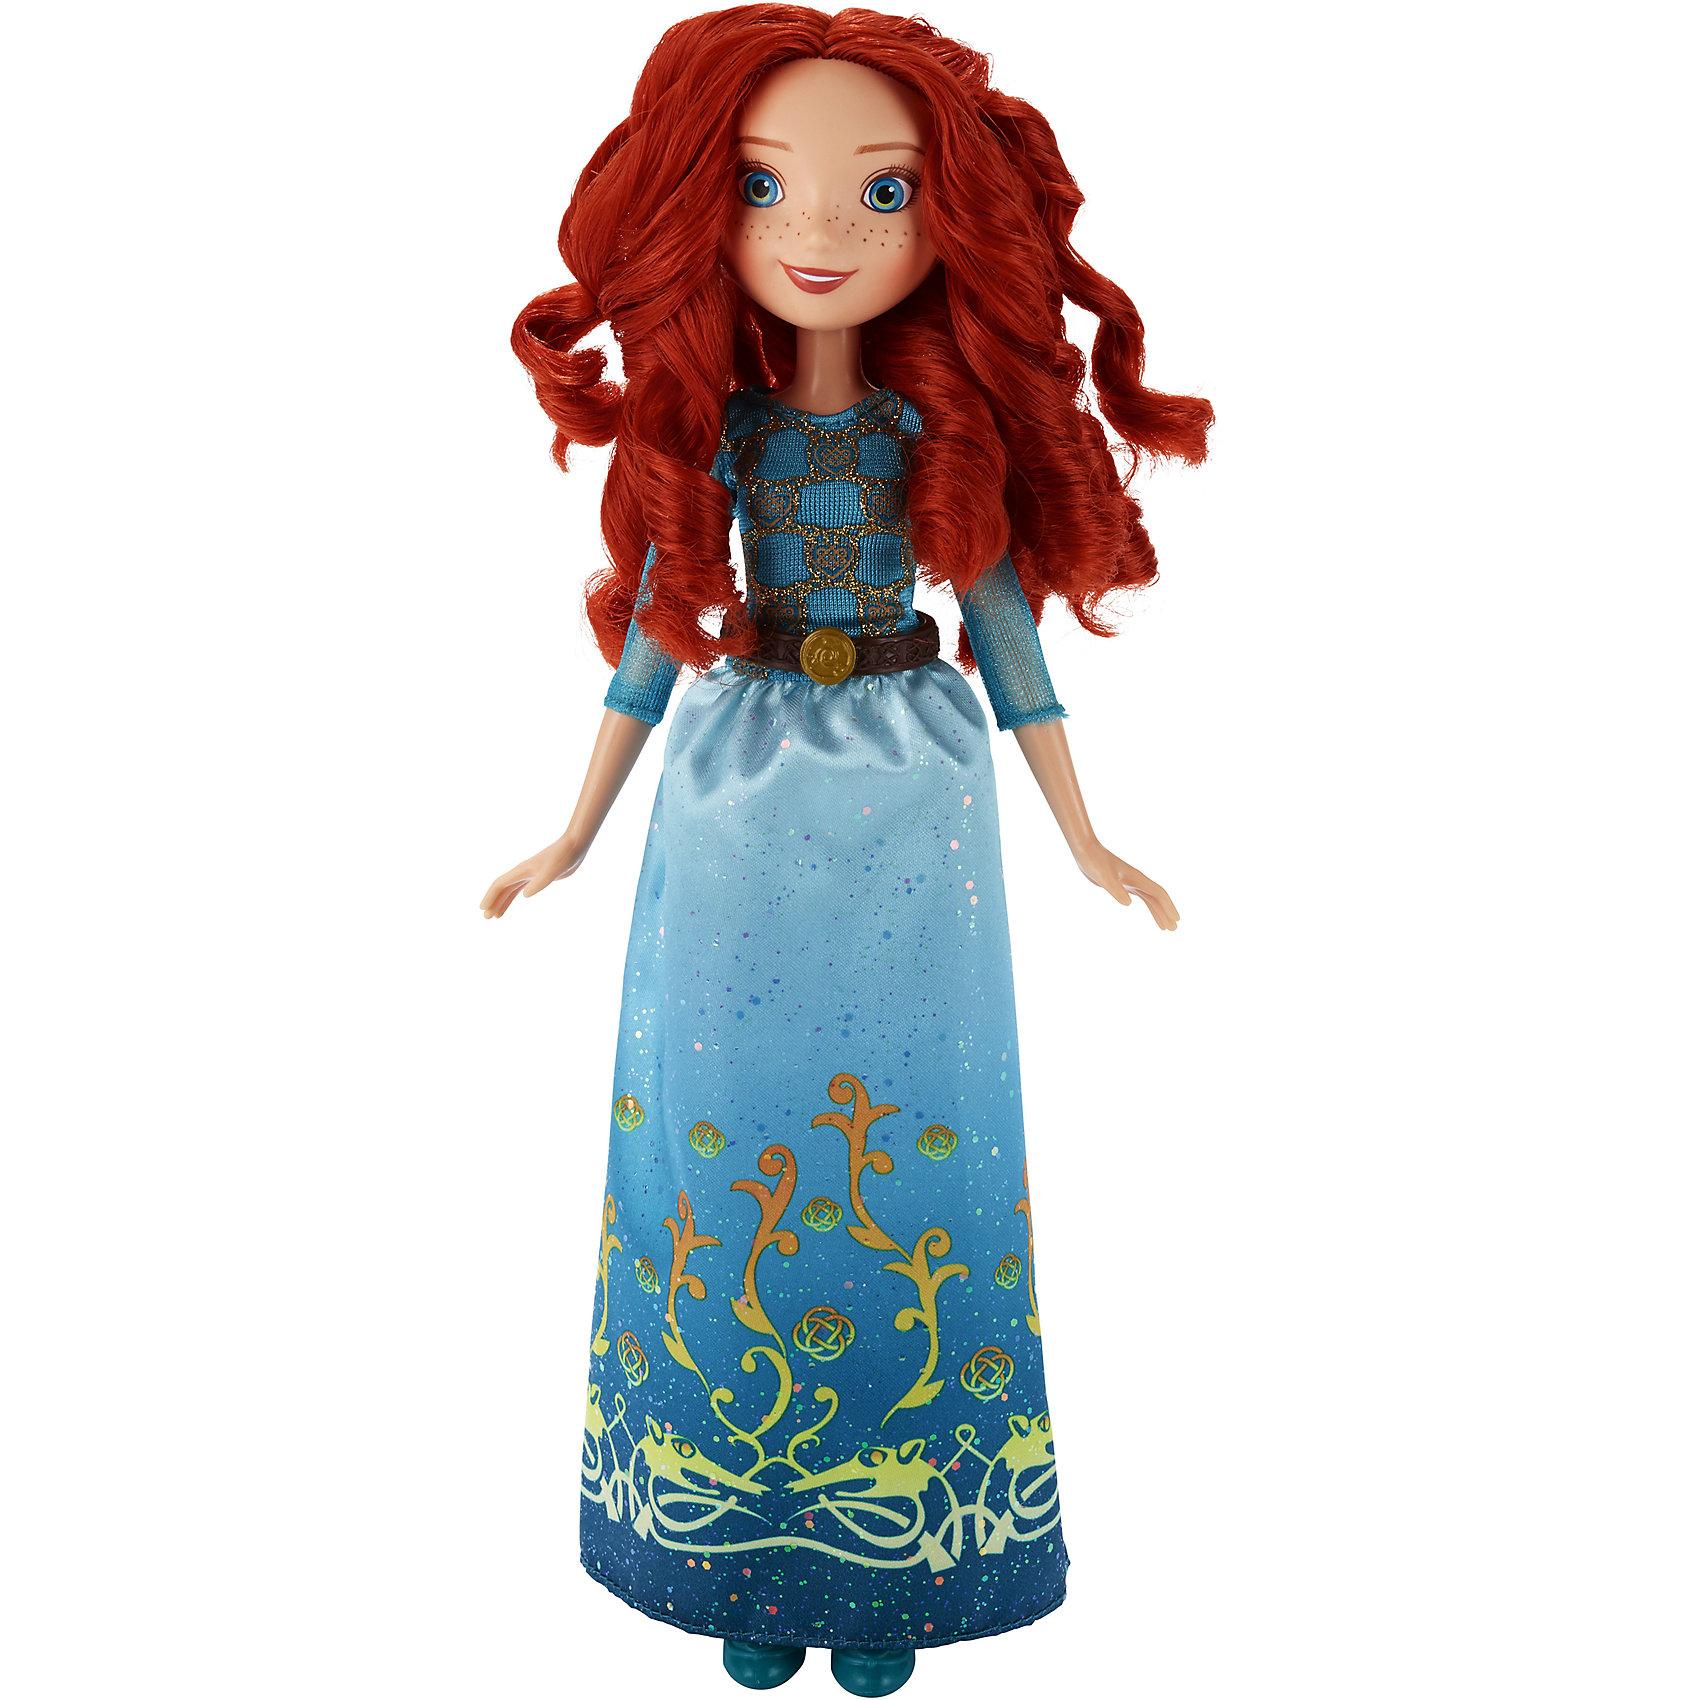 Hasbro Кукла Принцесса Мерида, Принцессы Дисней, B6447/B5825 hasbro кукла белоснежка принцессы дисней